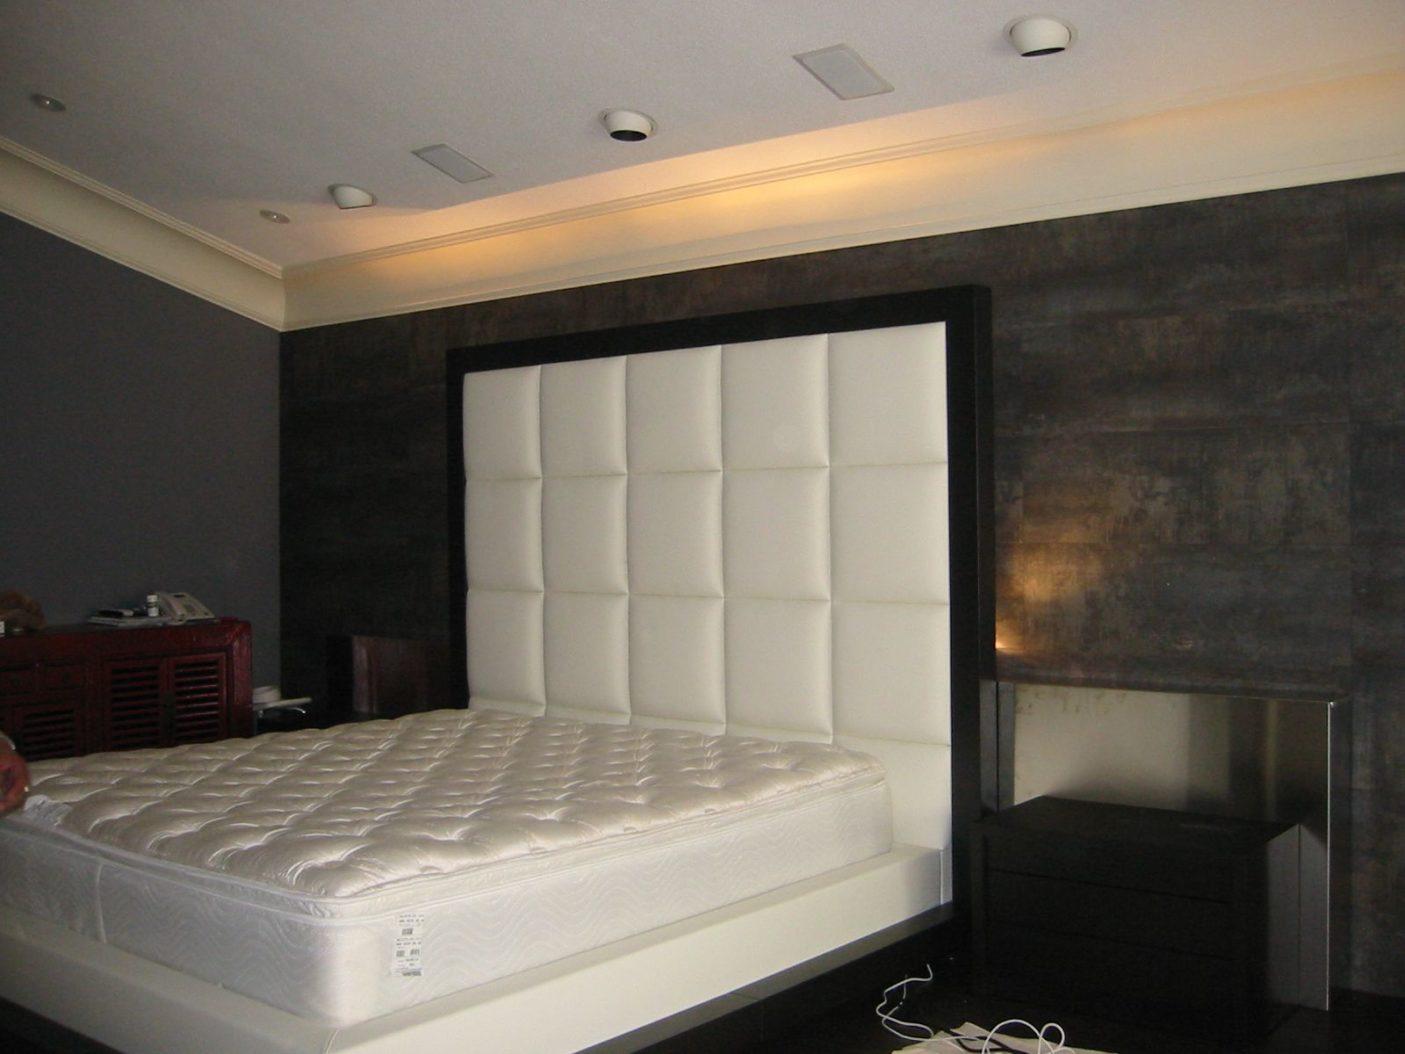 Bed-12.jpg